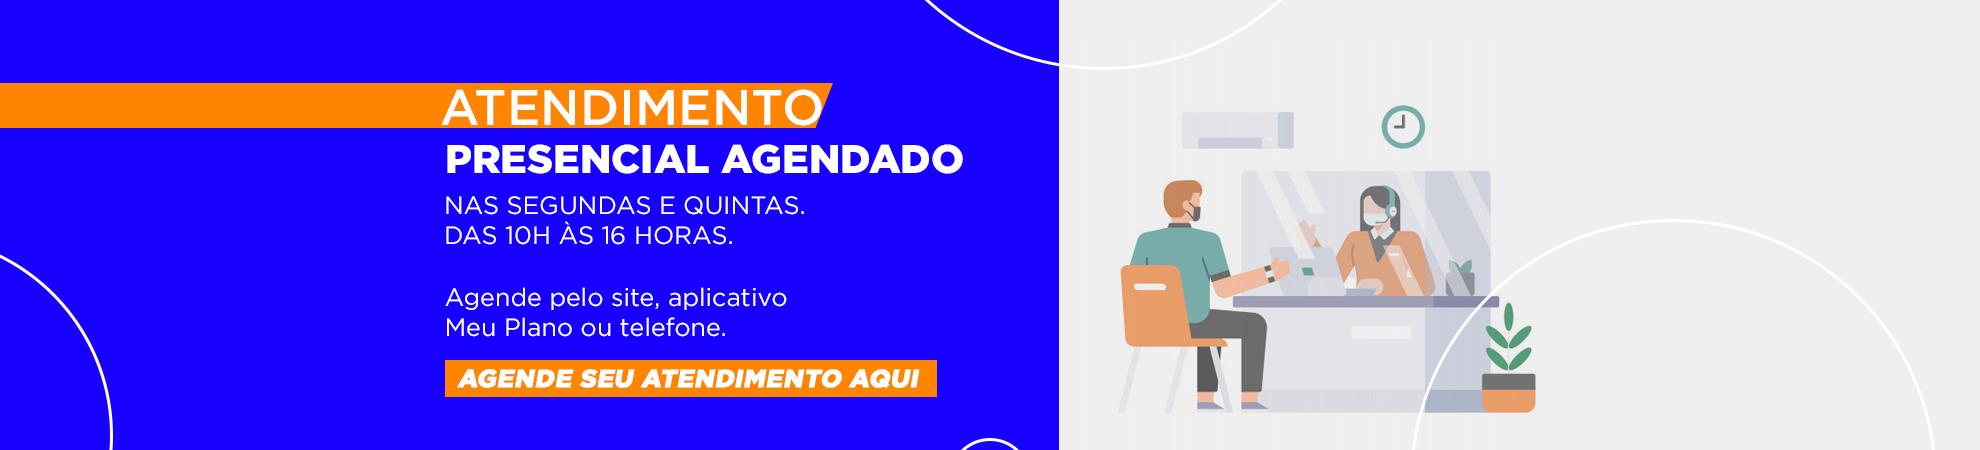 banner_agendamento